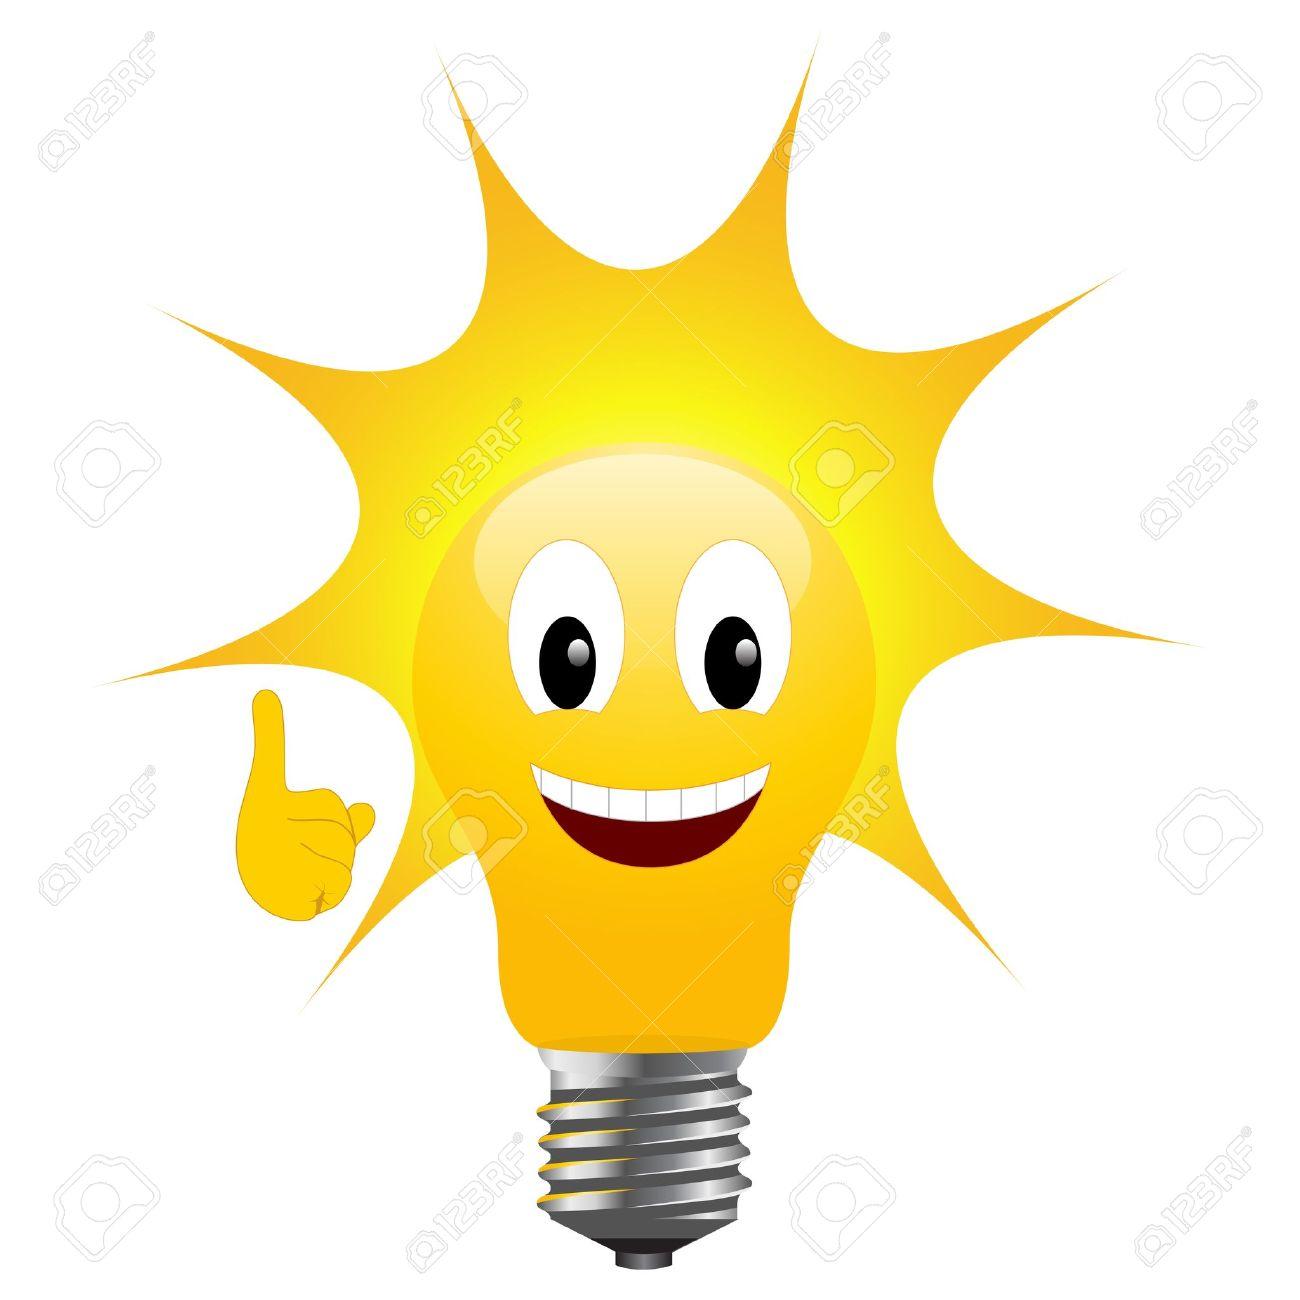 1300x1300 Light Bulb Clipart Bright Idea